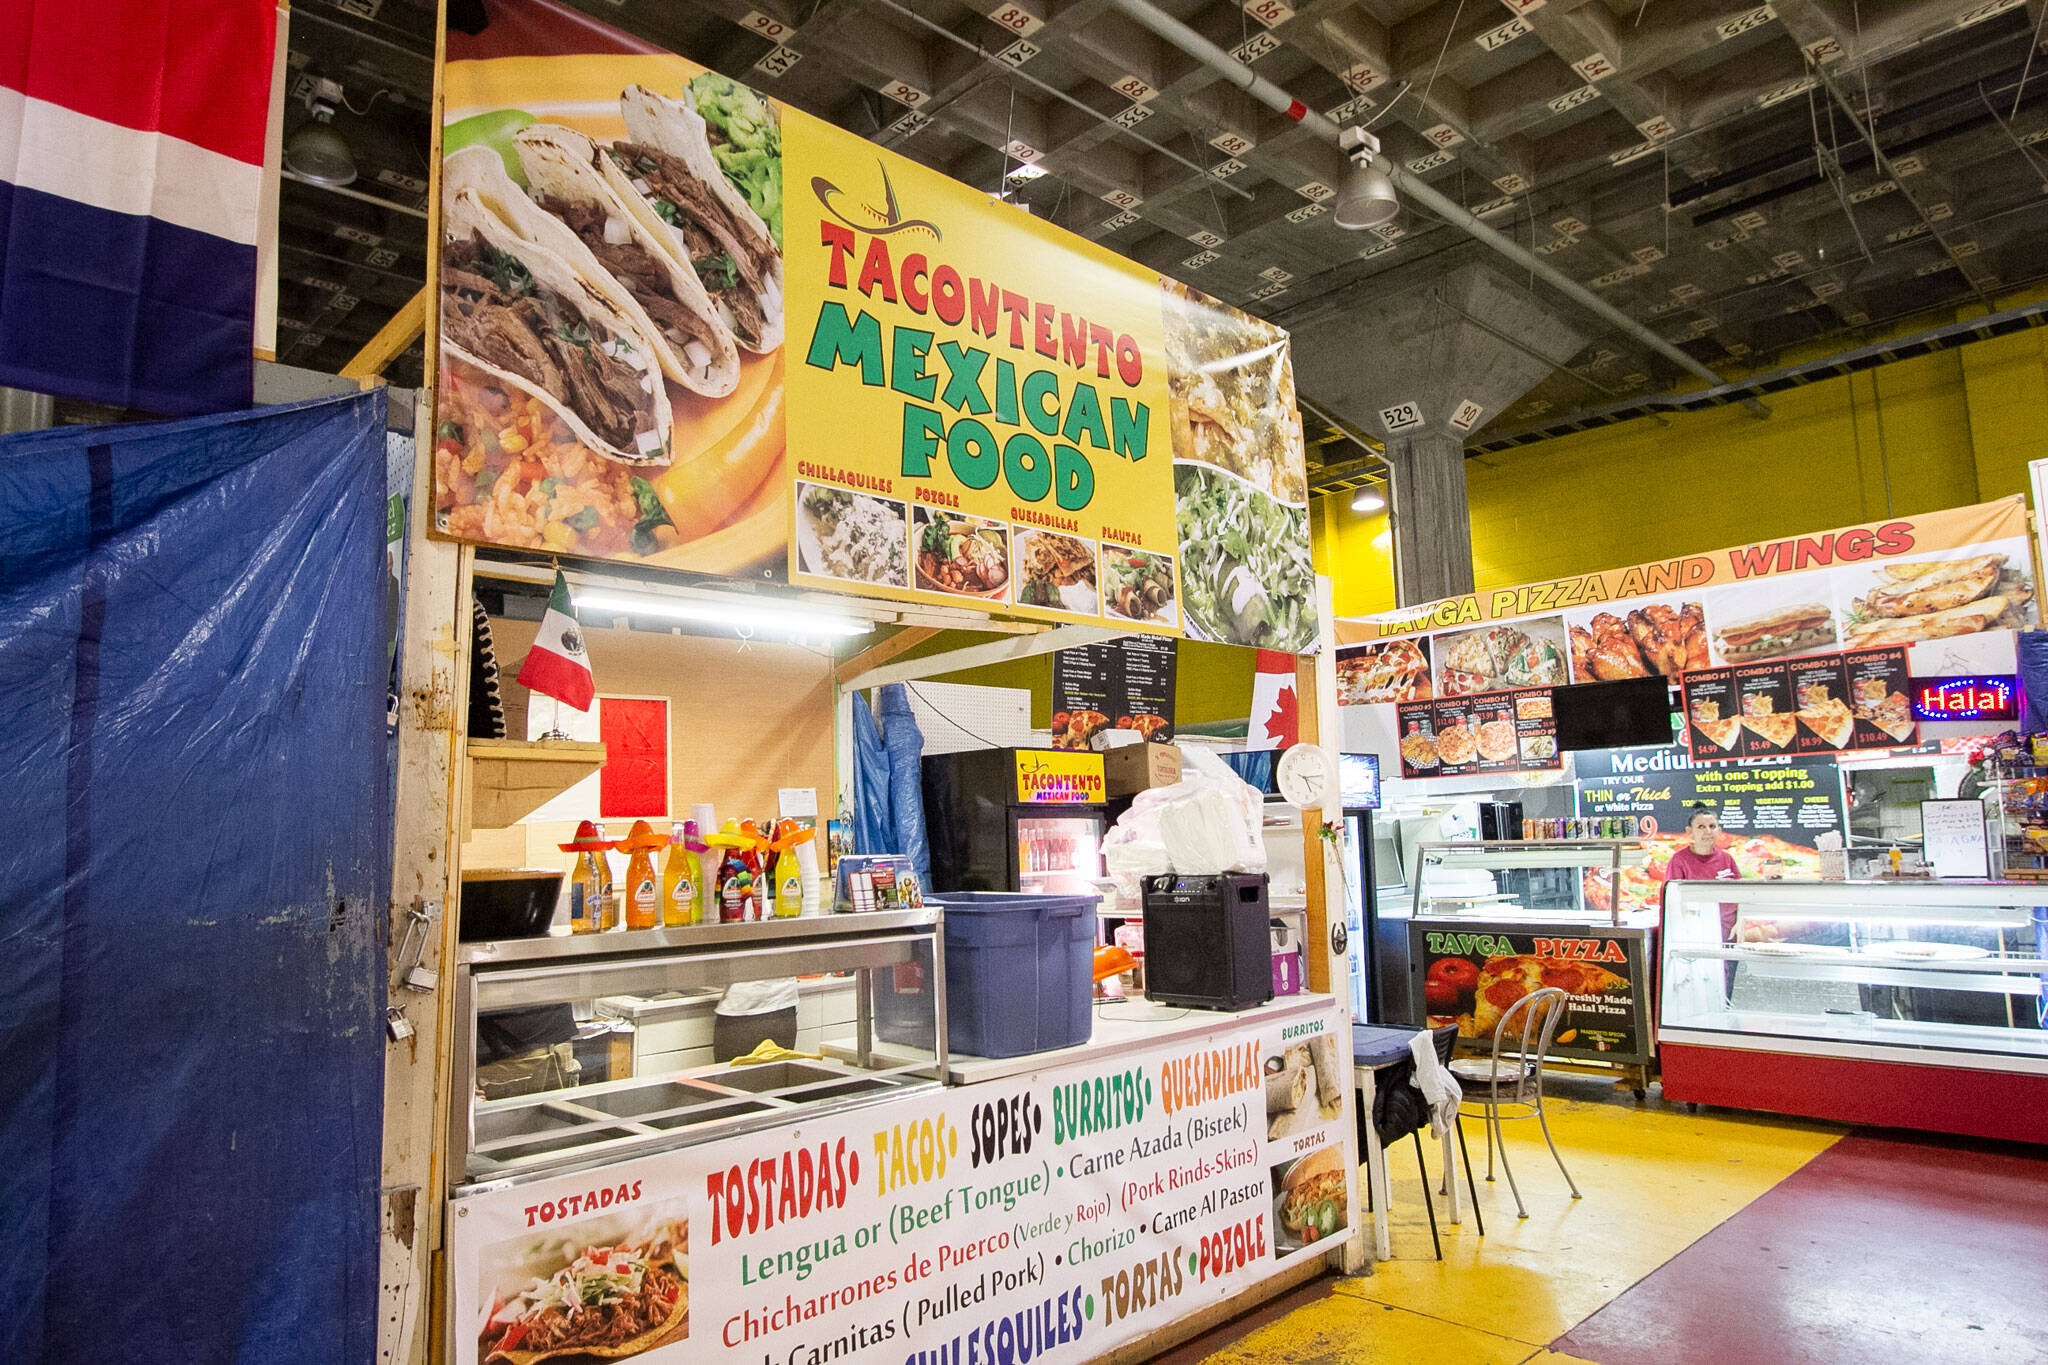 tacontento mexican foods toronto